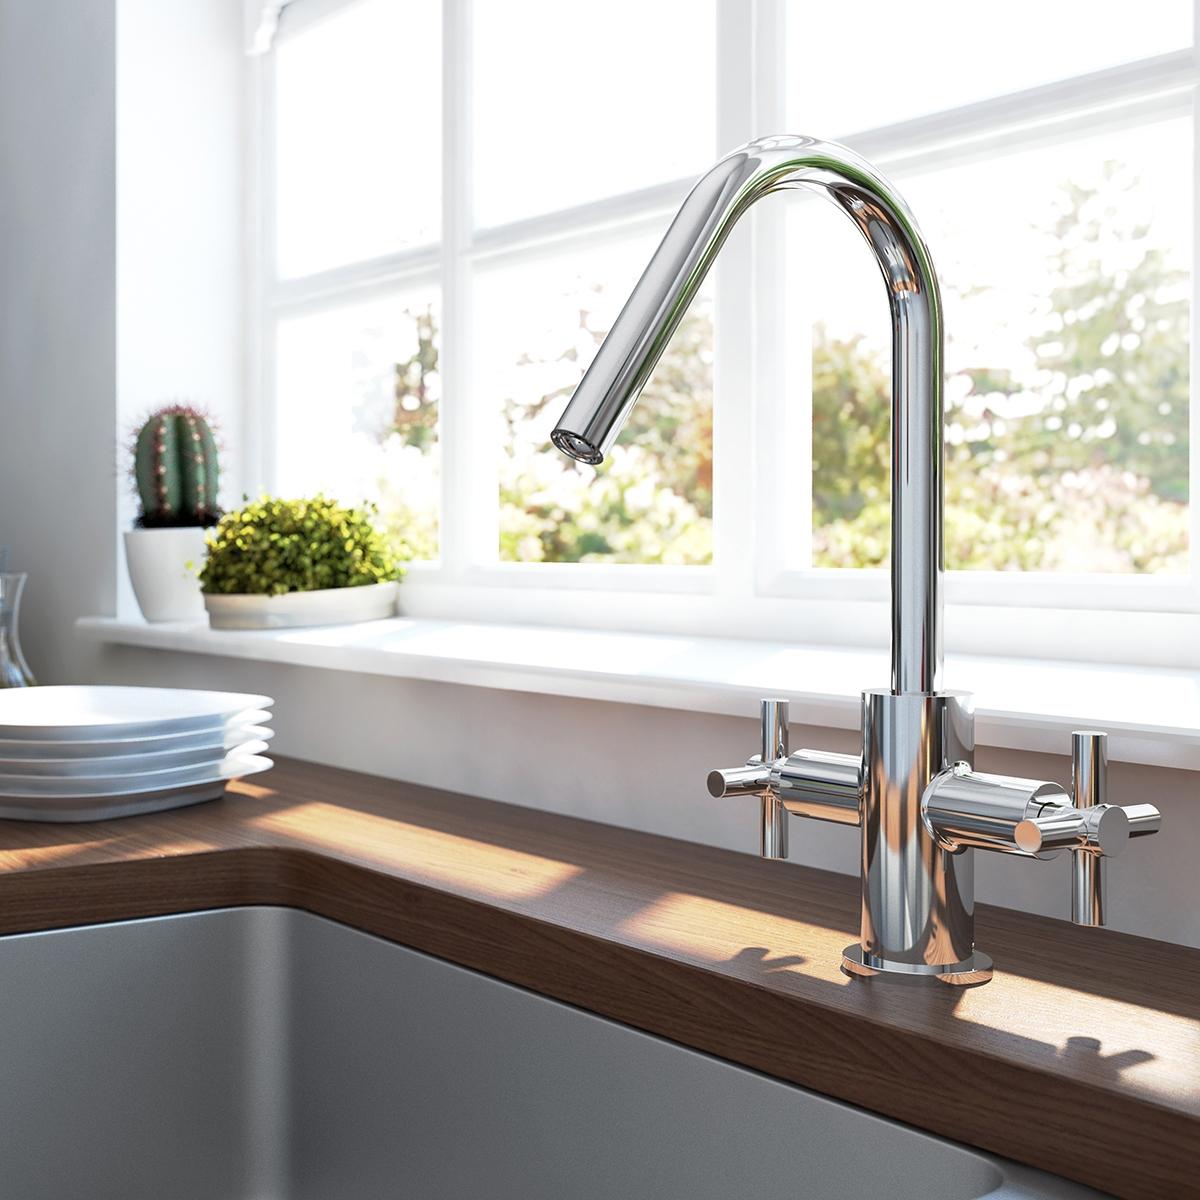 Bristan Pecan Easyfit Kitchen Sink Mixer Tap - Chrome